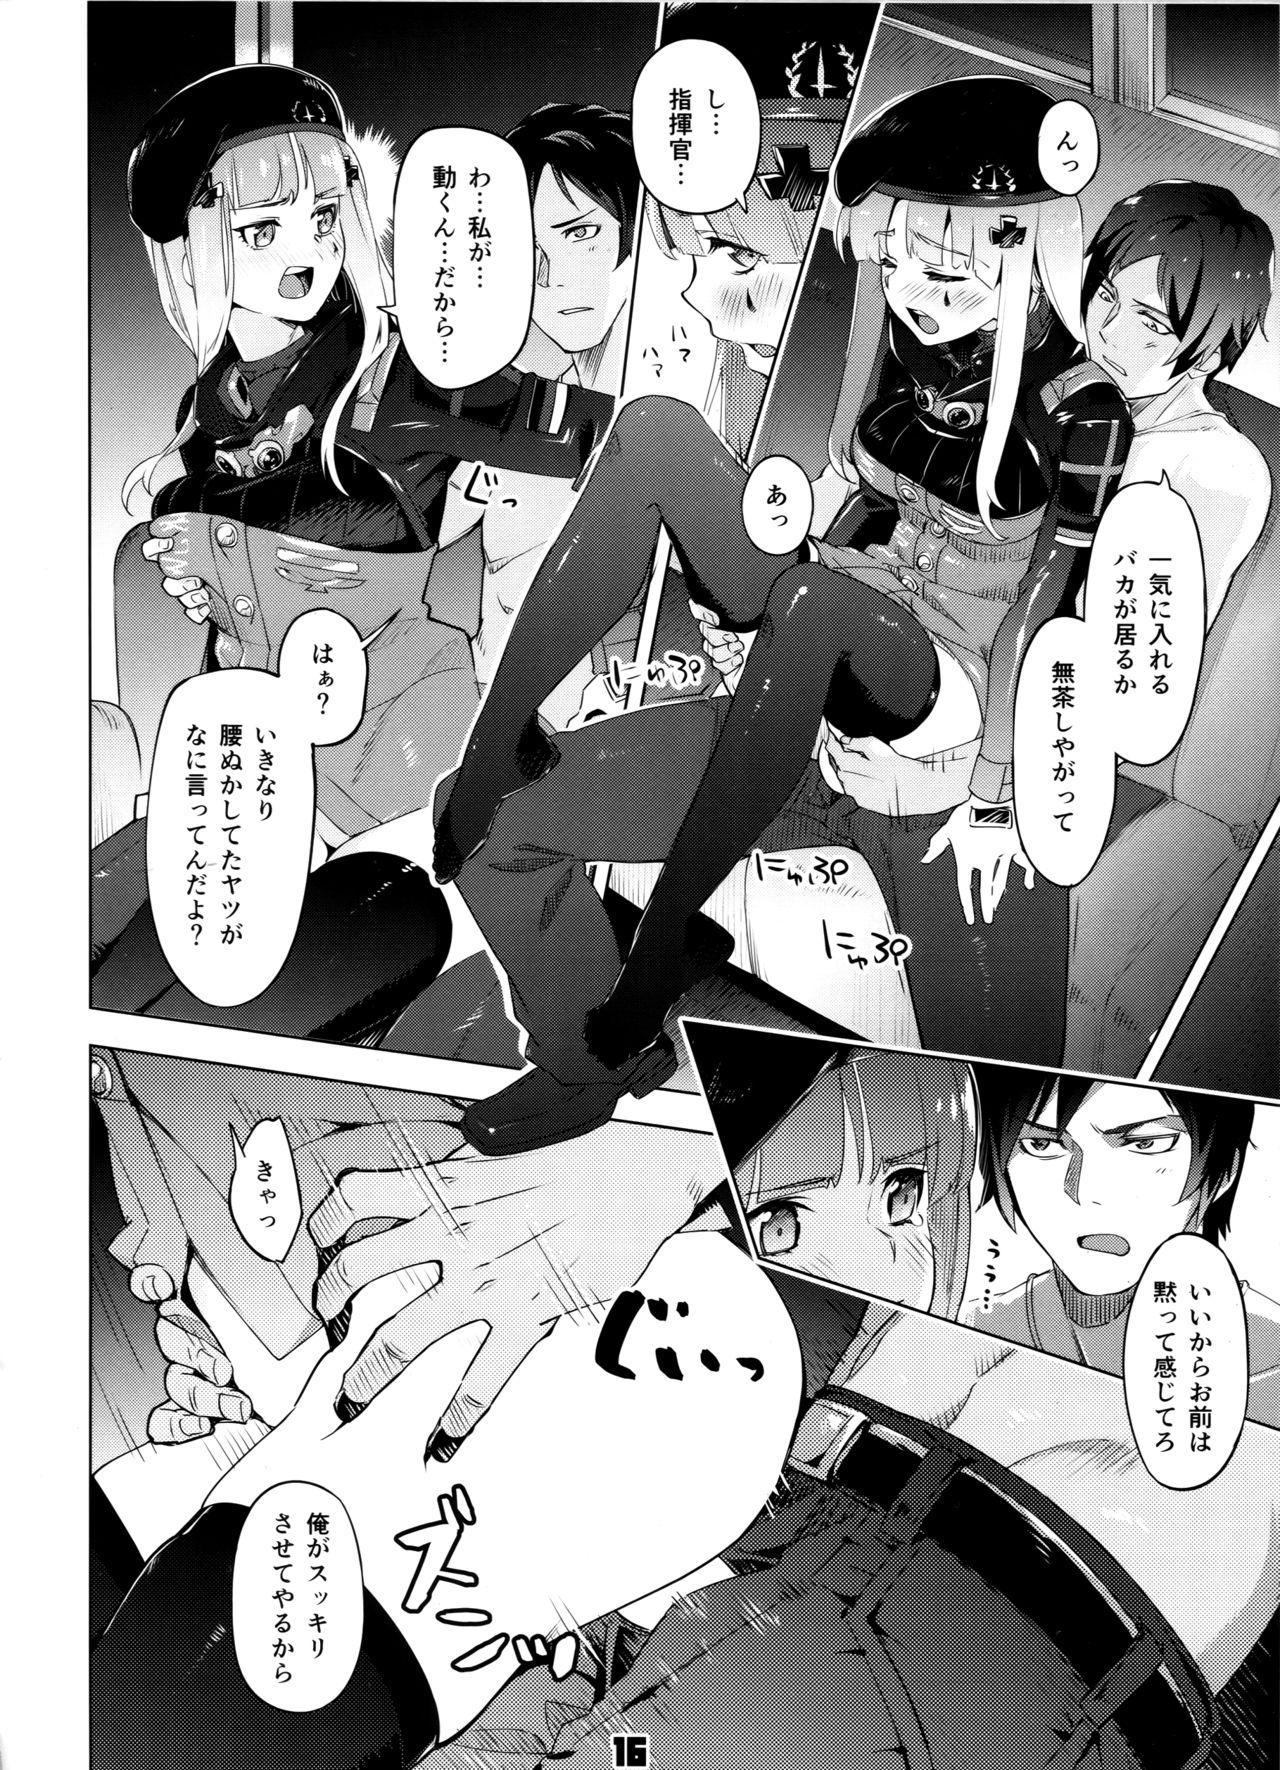 (C95) [Zombie to Yukaina Nakamatachi (Super Zombie)] Hensei Kakudai - 5-nin de Kakareba Kowakunai! (Girls' Frontline) 14